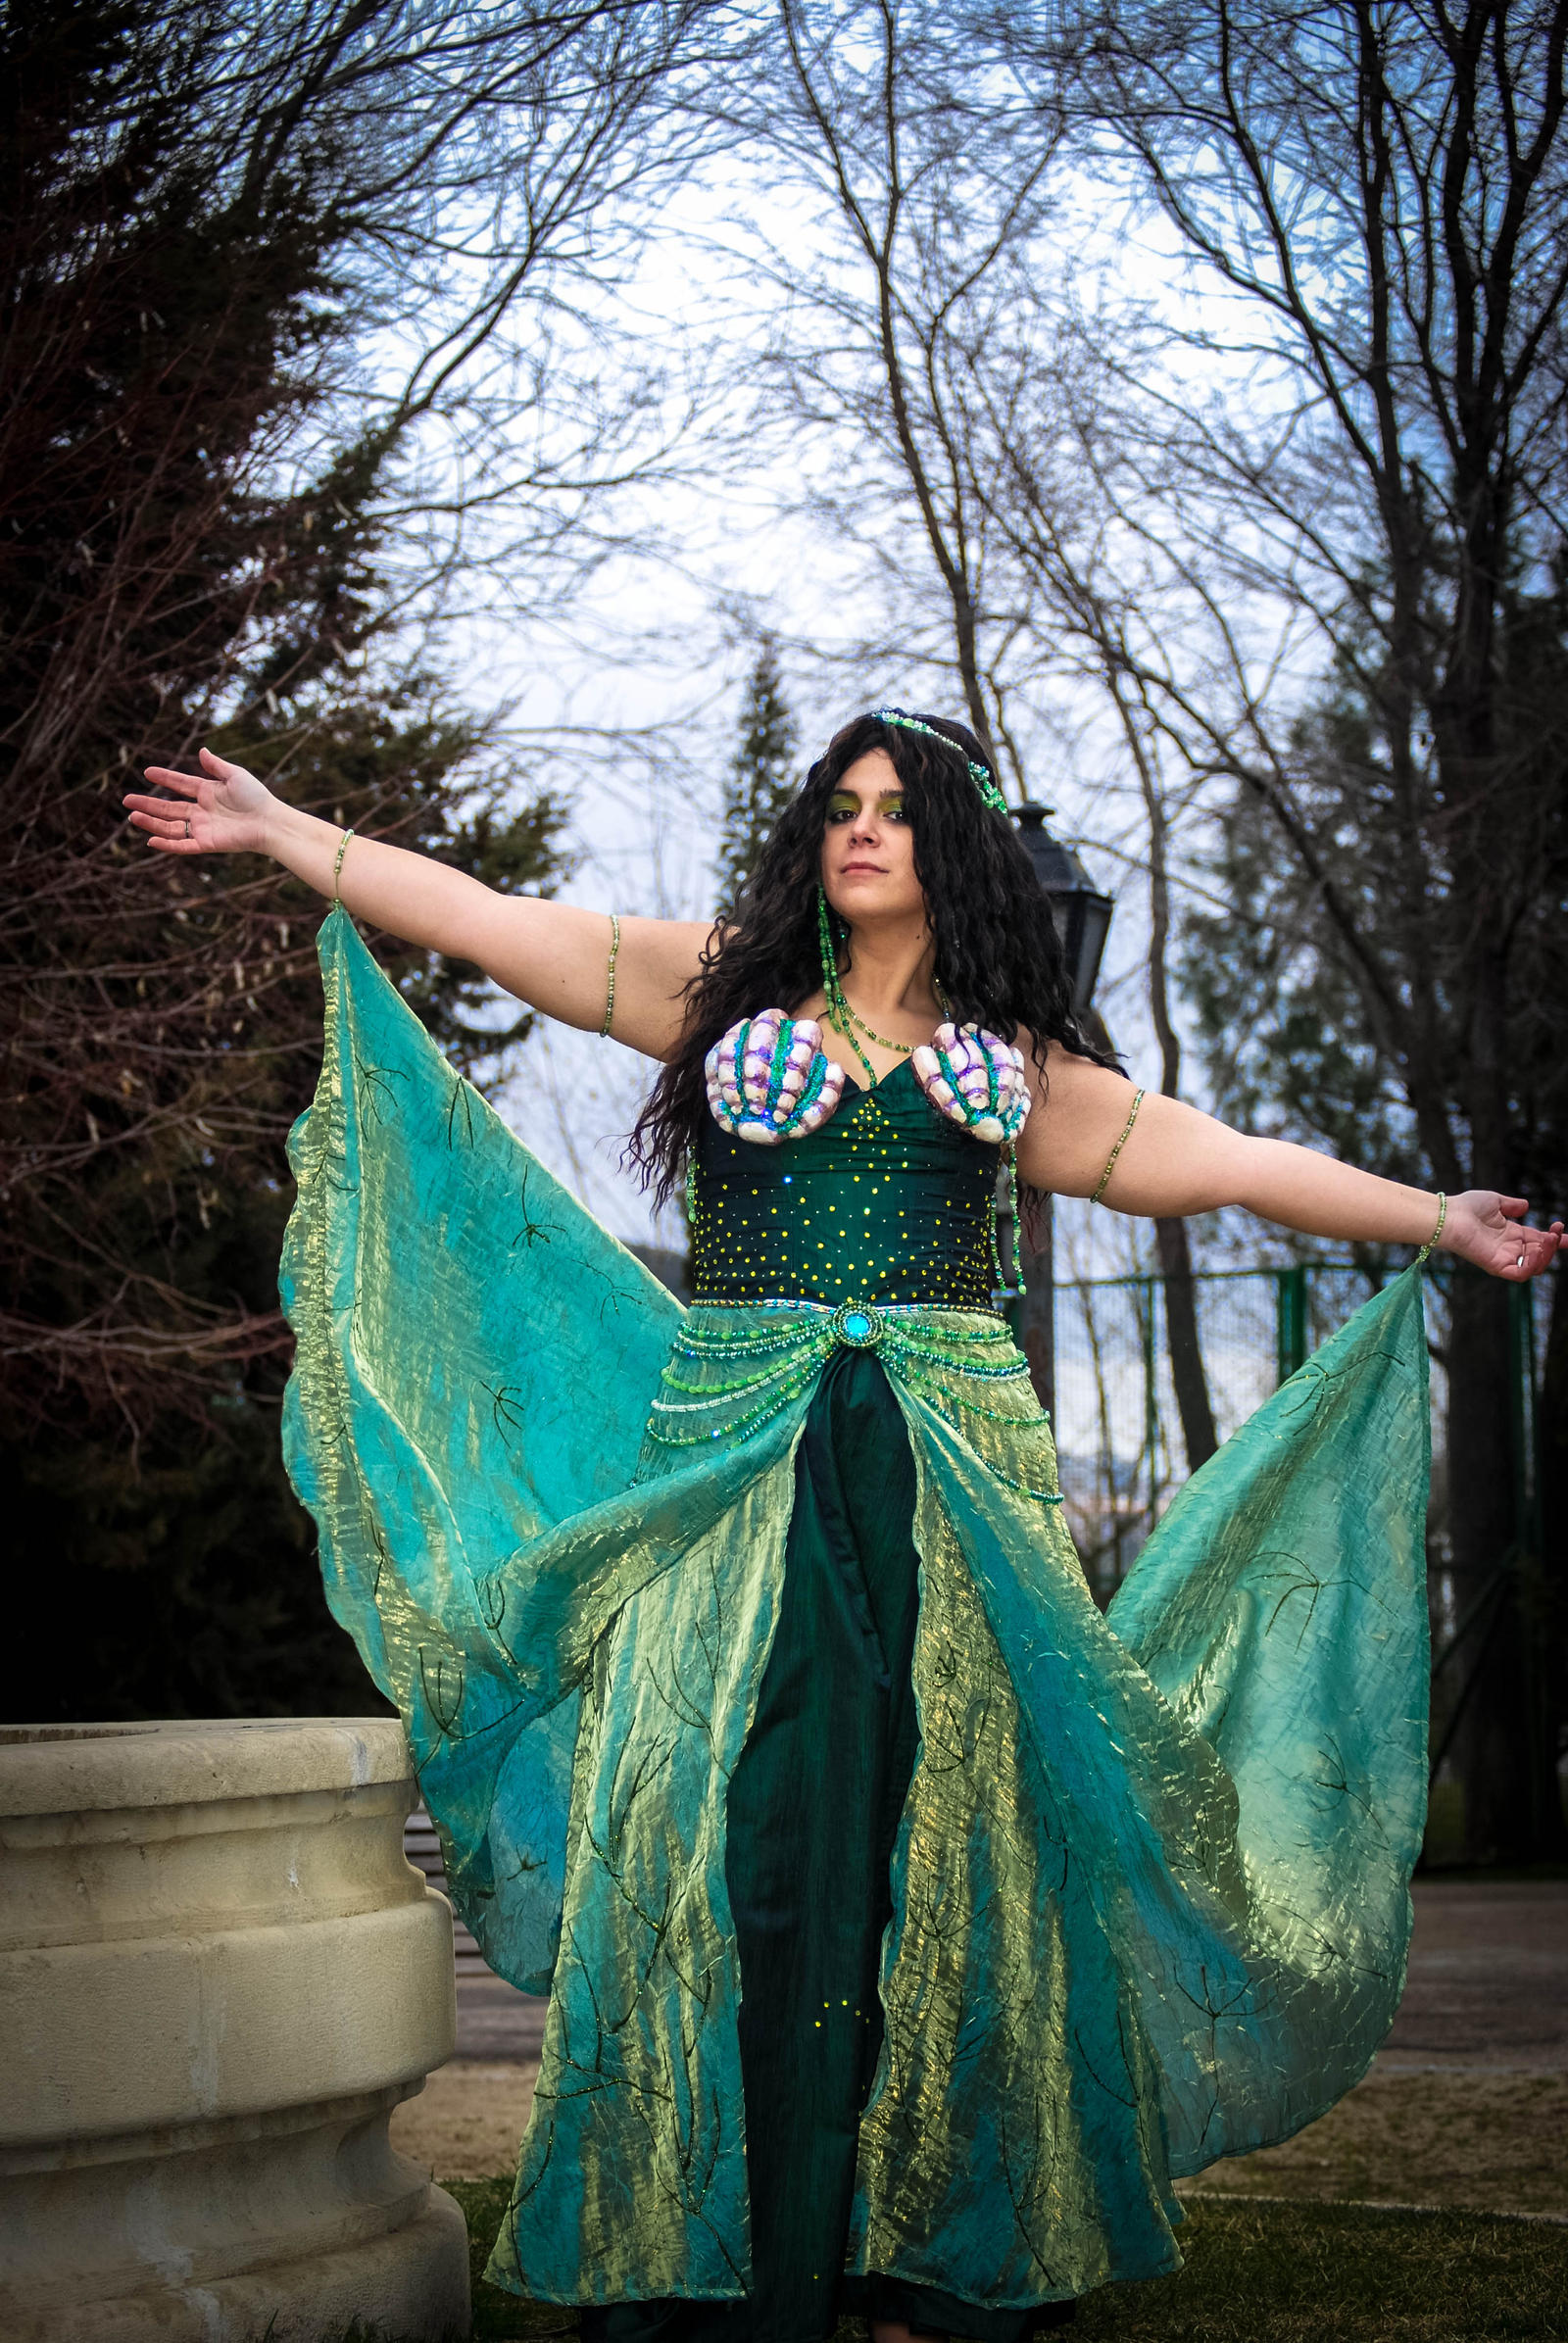 Lady of the lake by wilbur-kyriu